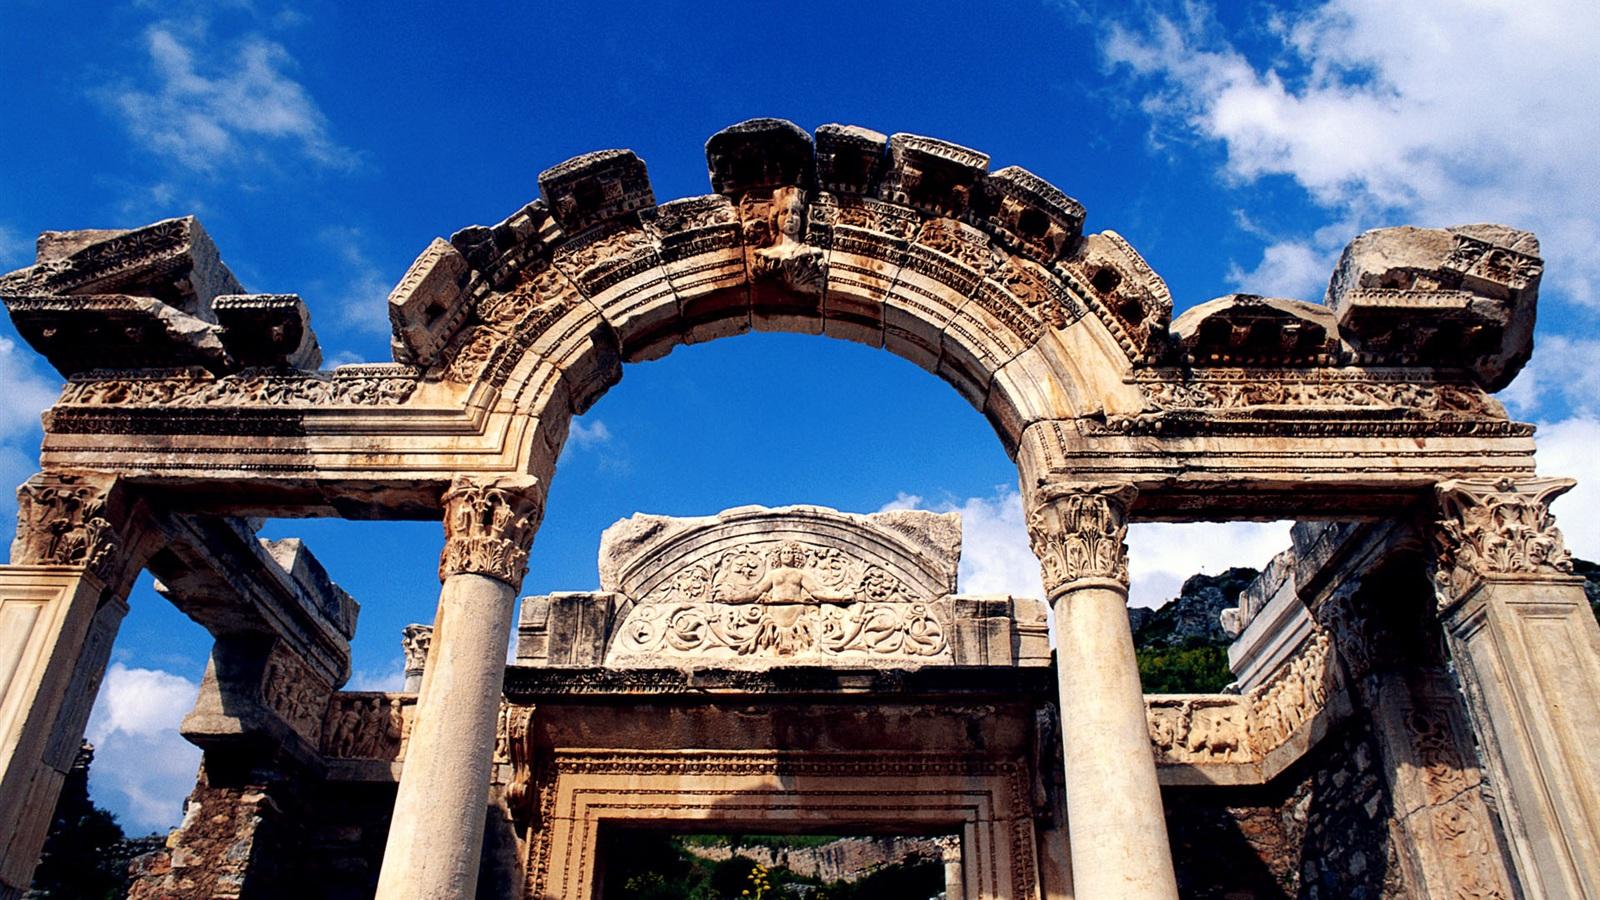 Temple of Hadrian in Turkey Wallpaper  1600x900 ...